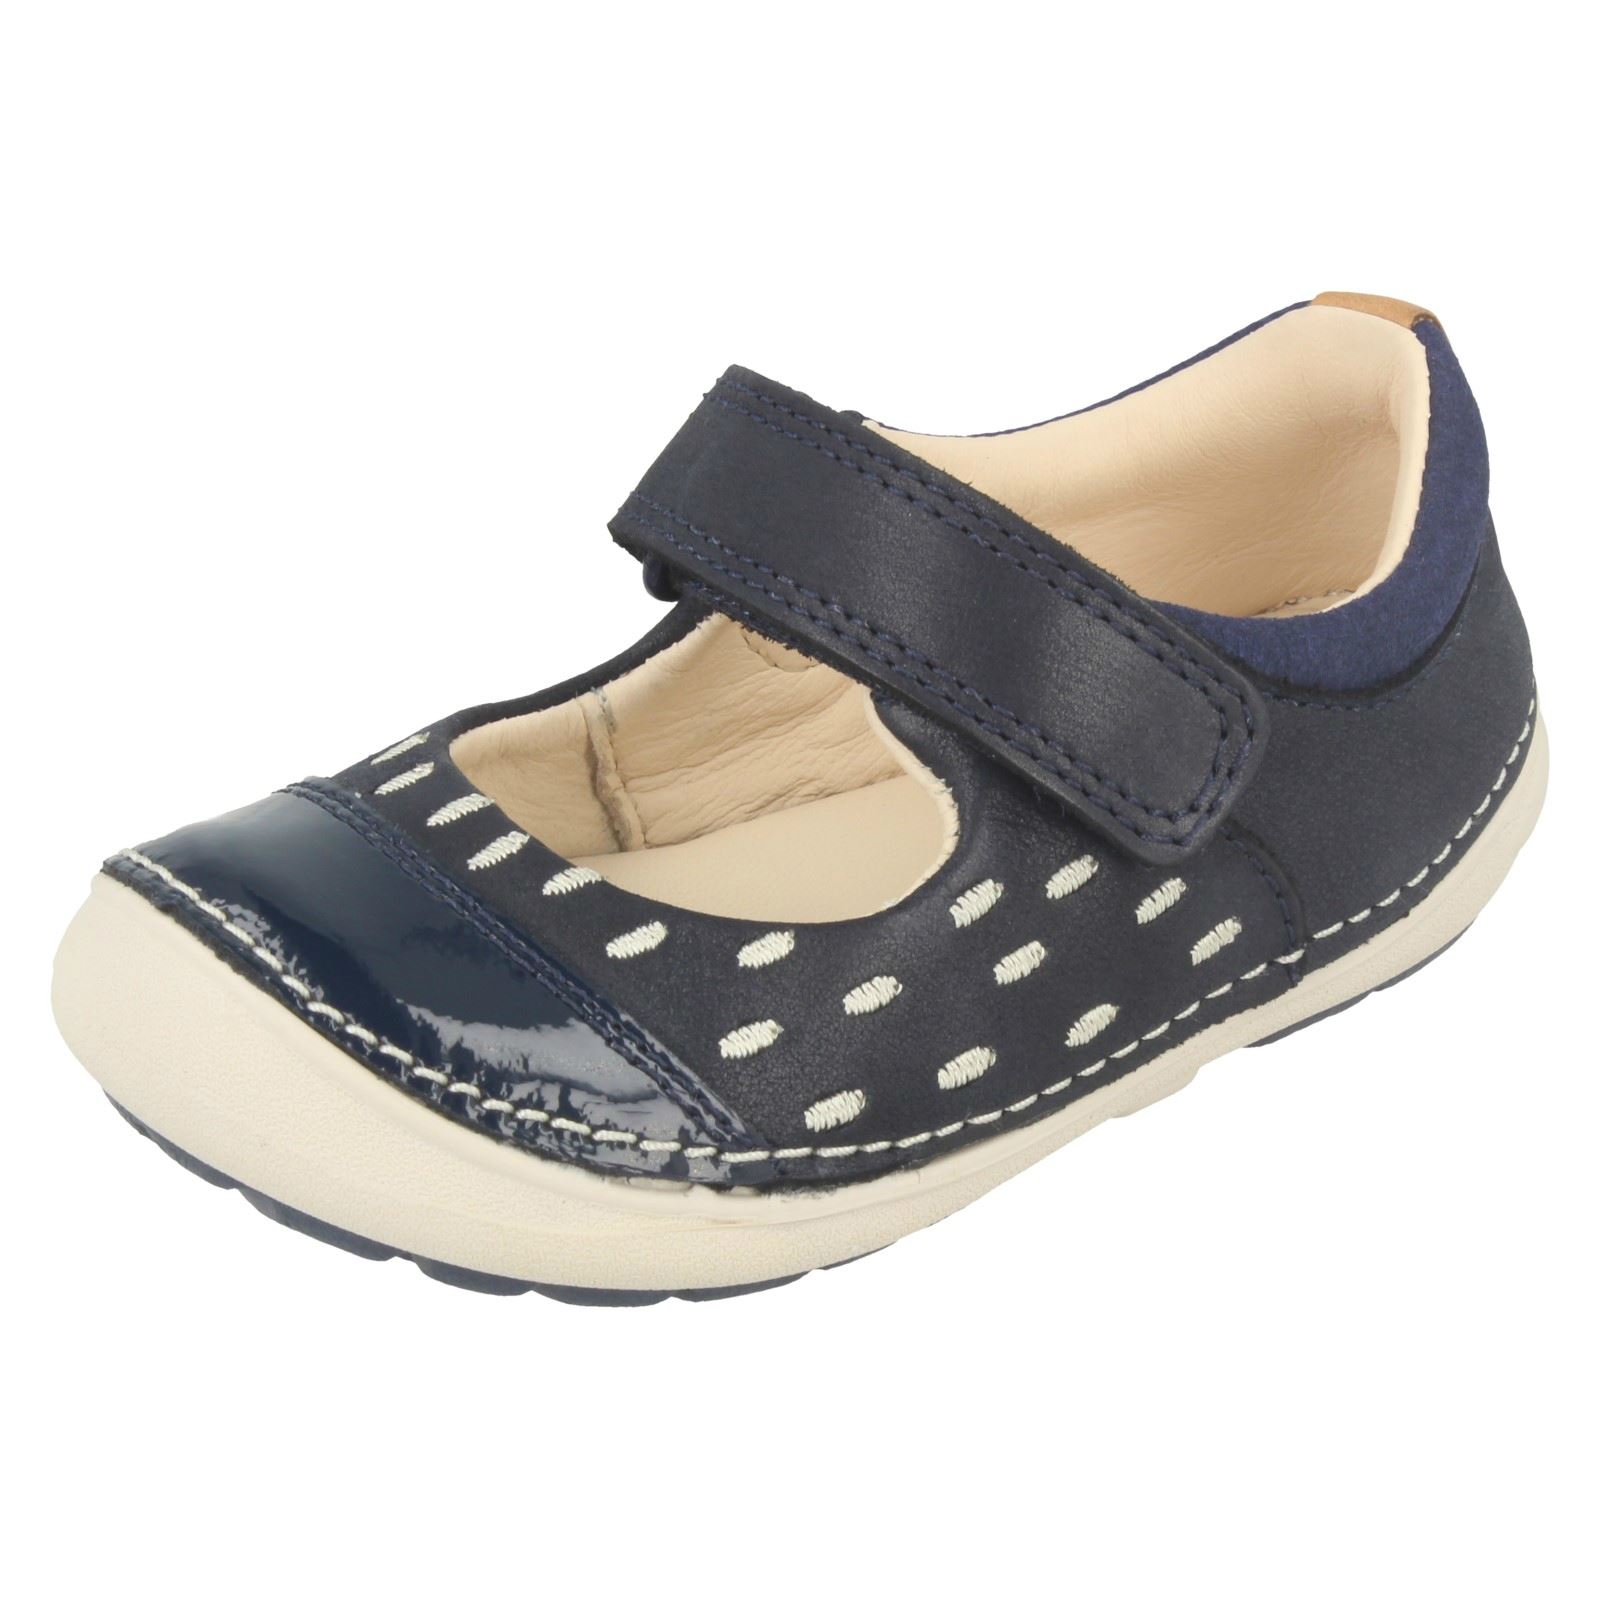 Infant-Girls-Clarks-Hook-amp-Loop-First-Shoes-